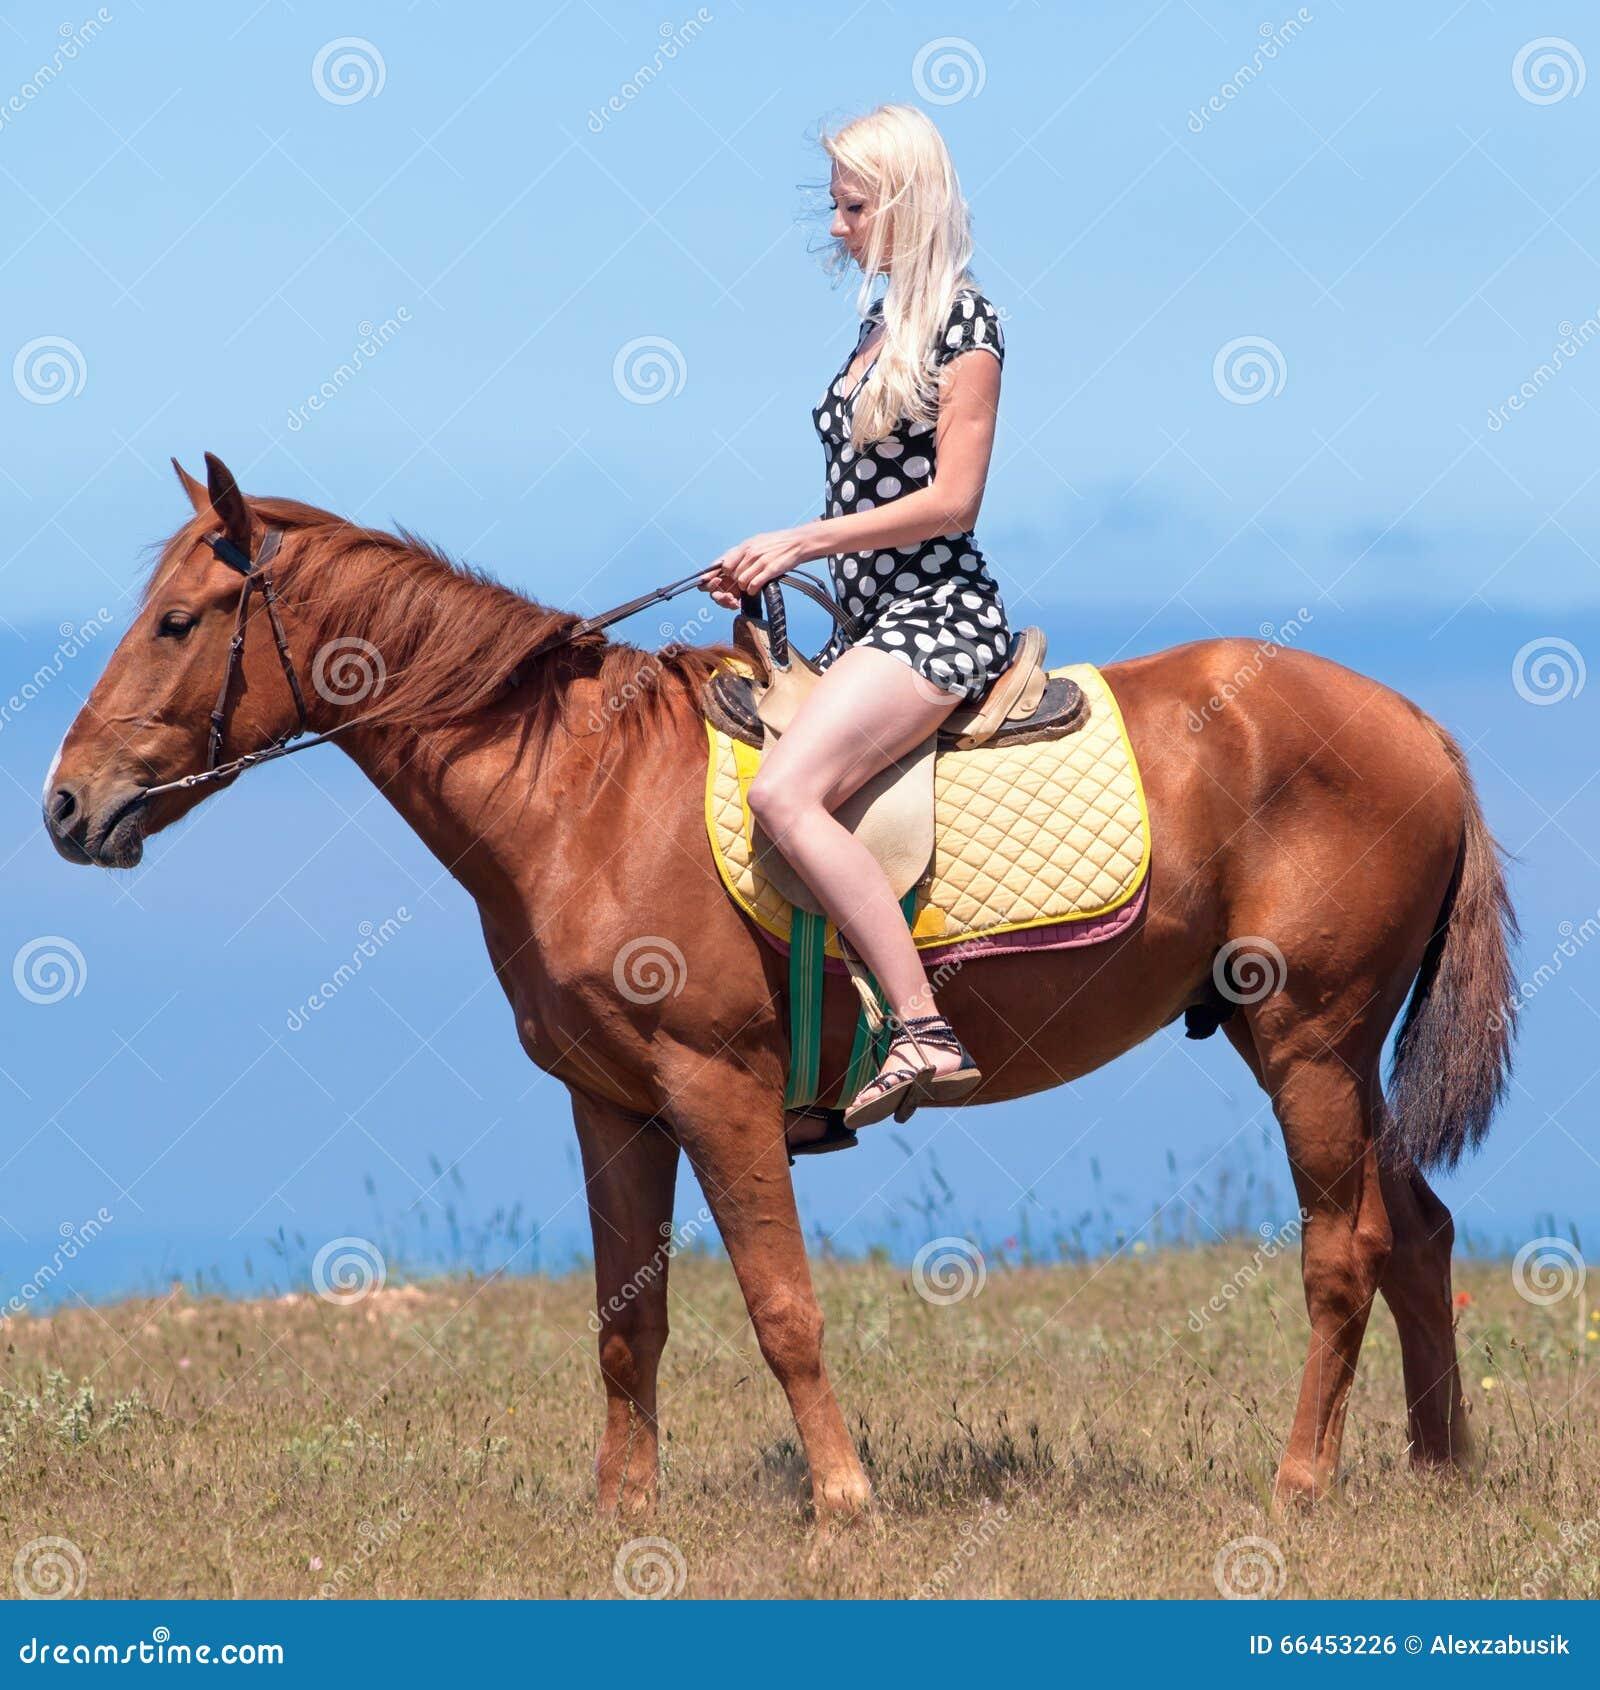 Girl in polka-dot dress rides on brown gelding